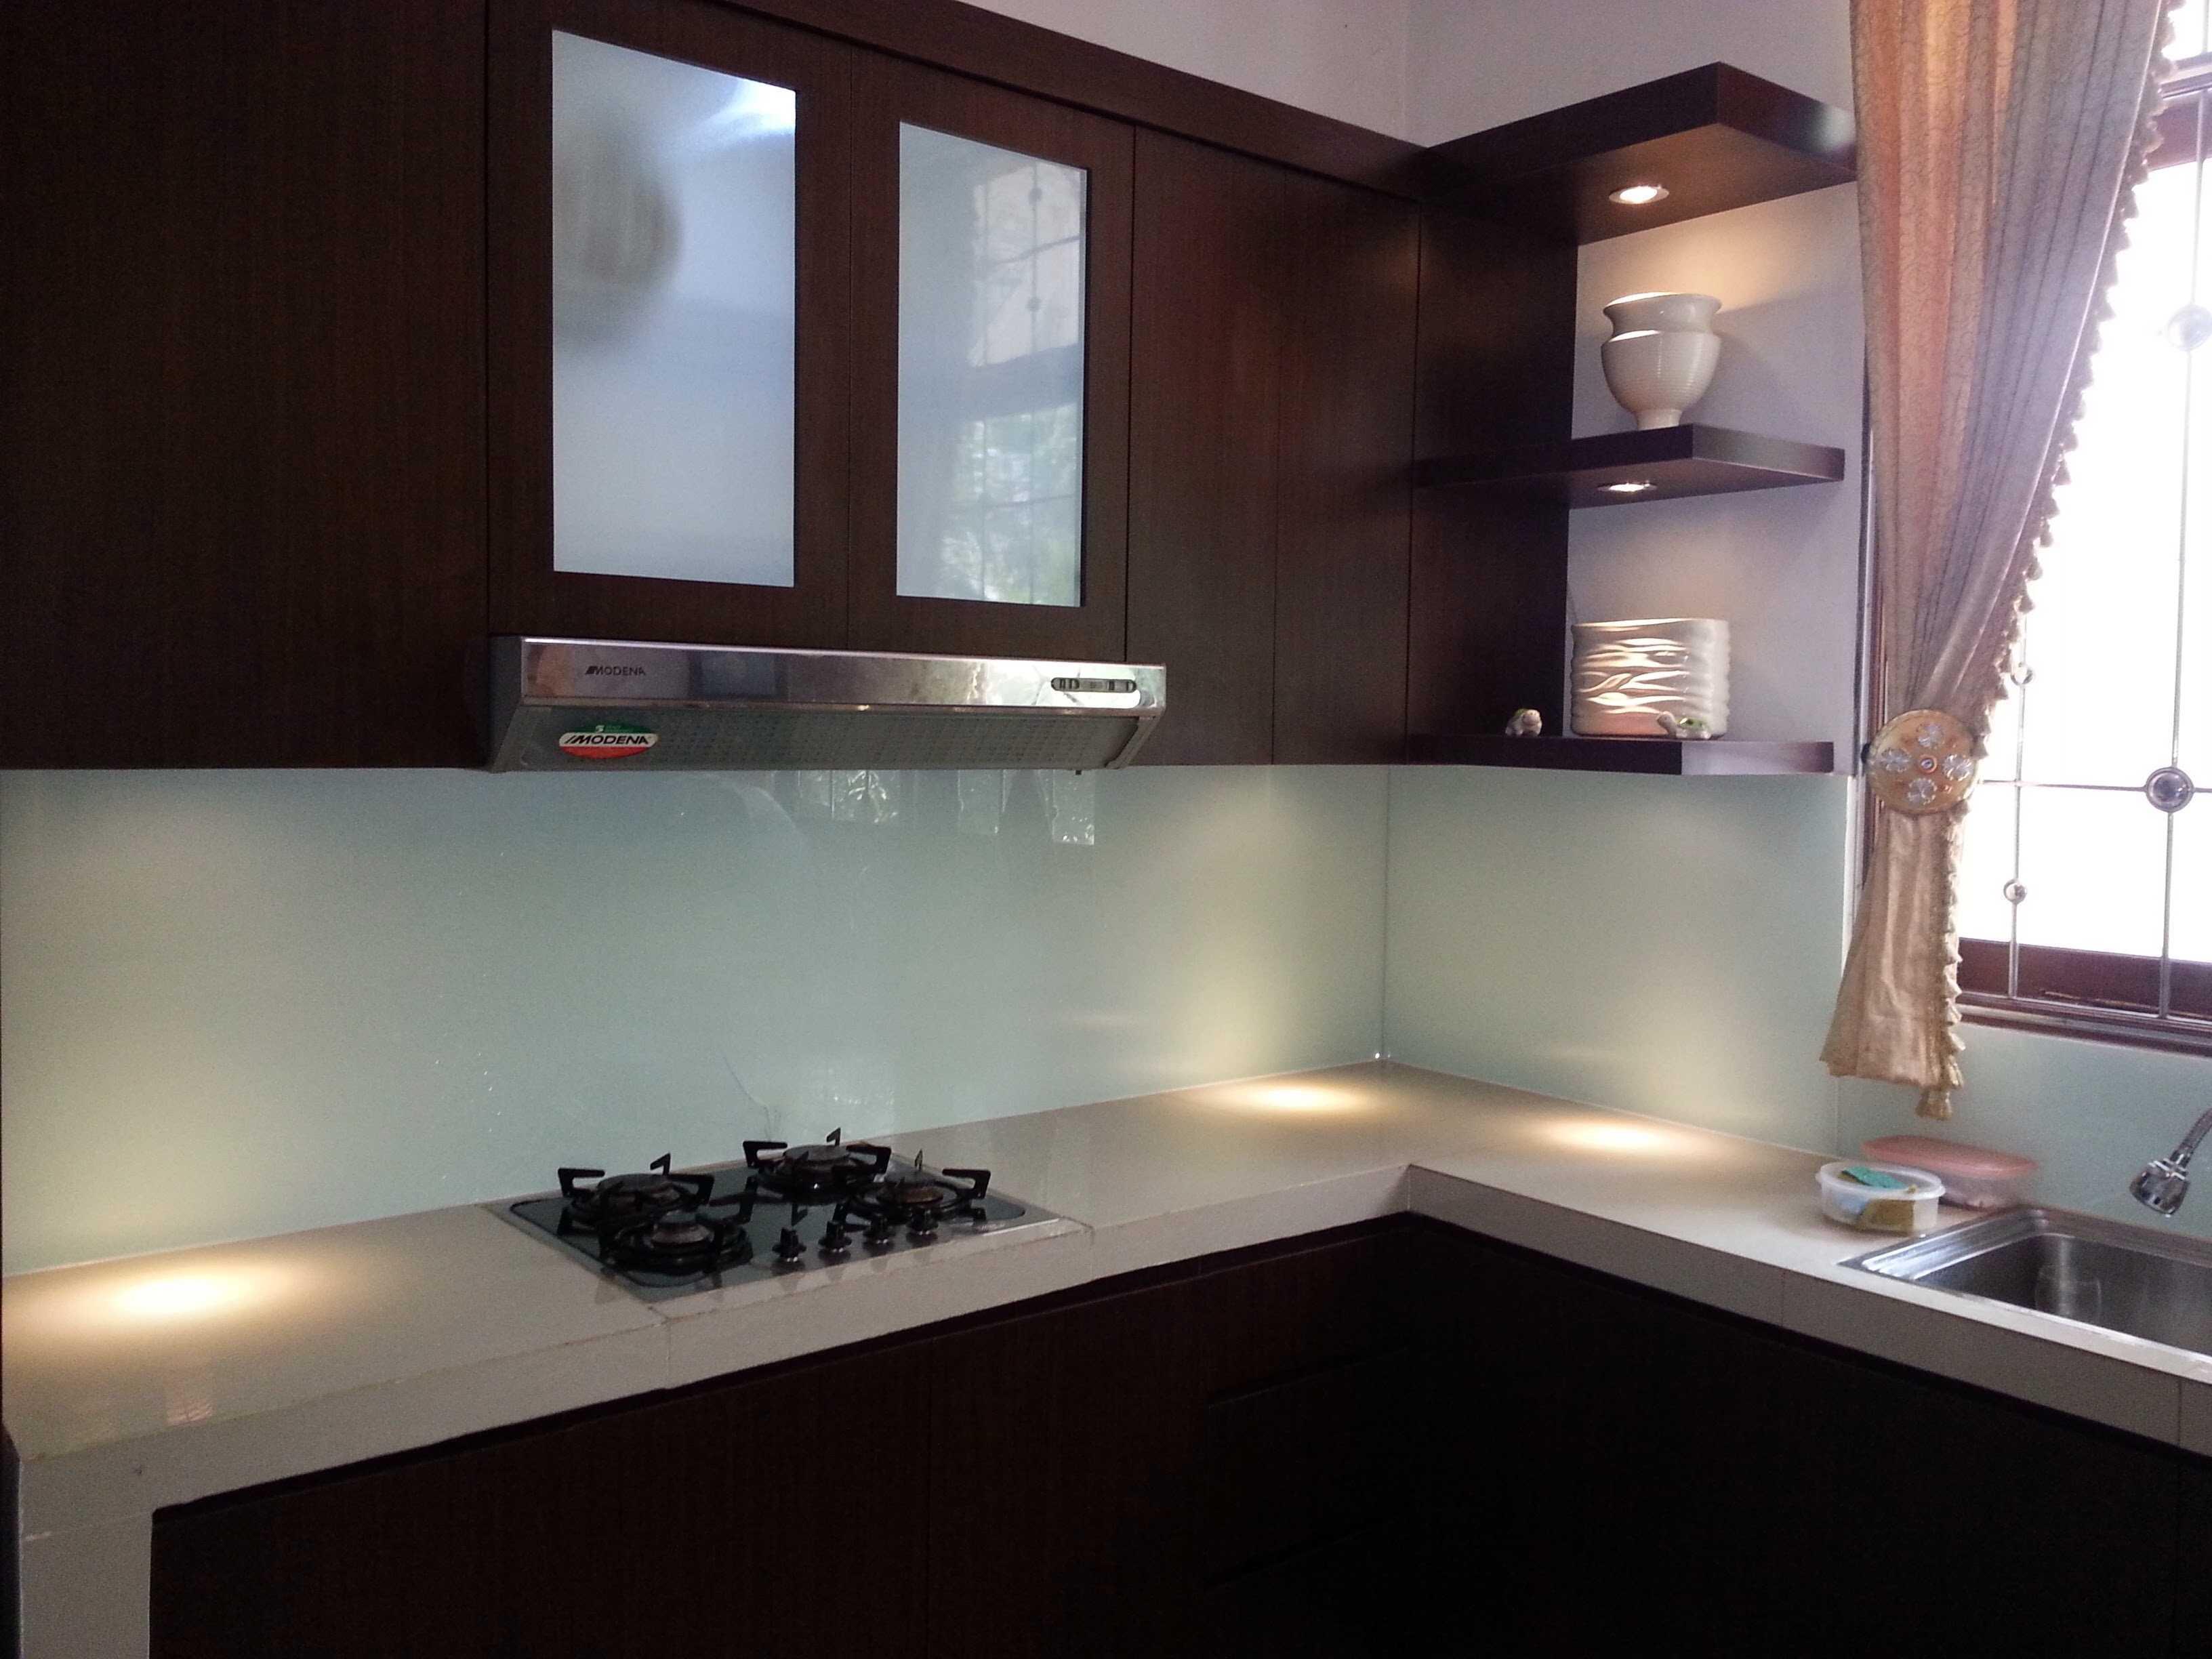 R-E Design Rumah Tinggal Depok Depok Kitchen   25156